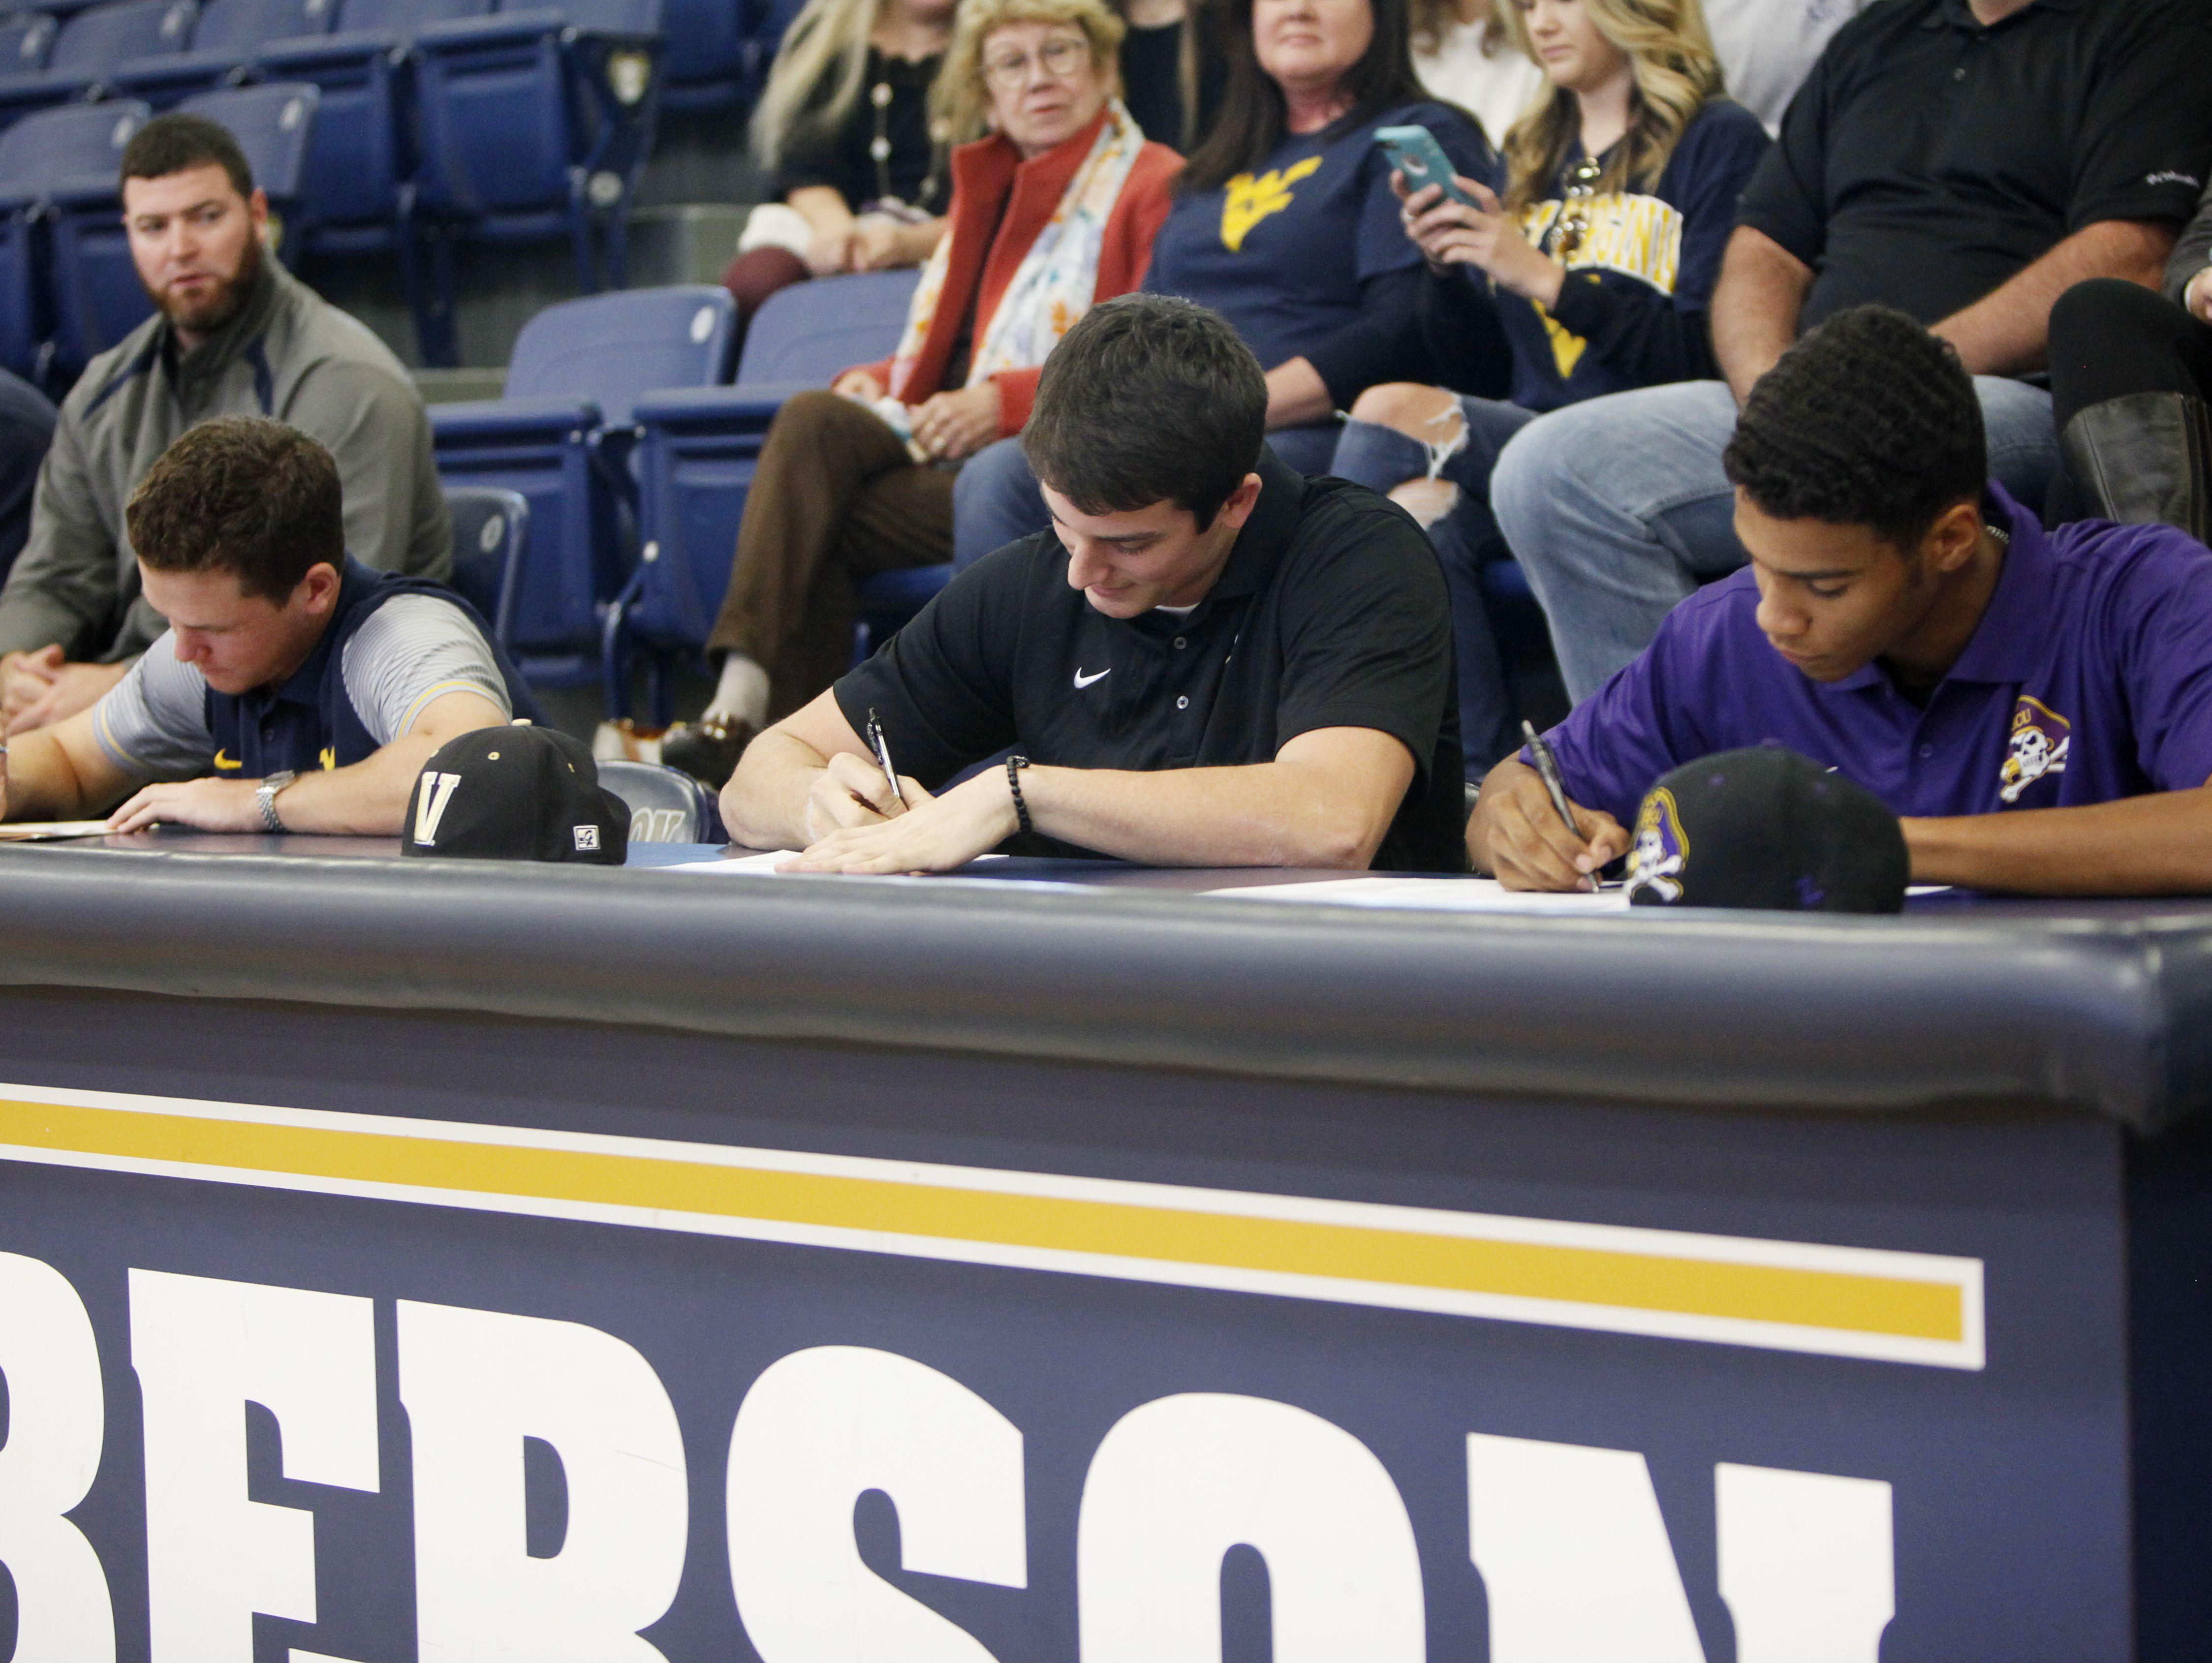 Roberson baseball teammates Garrett Blaylock (Vanderbilt) and Collin Watt (East Carolina) signed with colleges on Wednesday along with Rams golfer Matt Sharpstene (West Virginia).